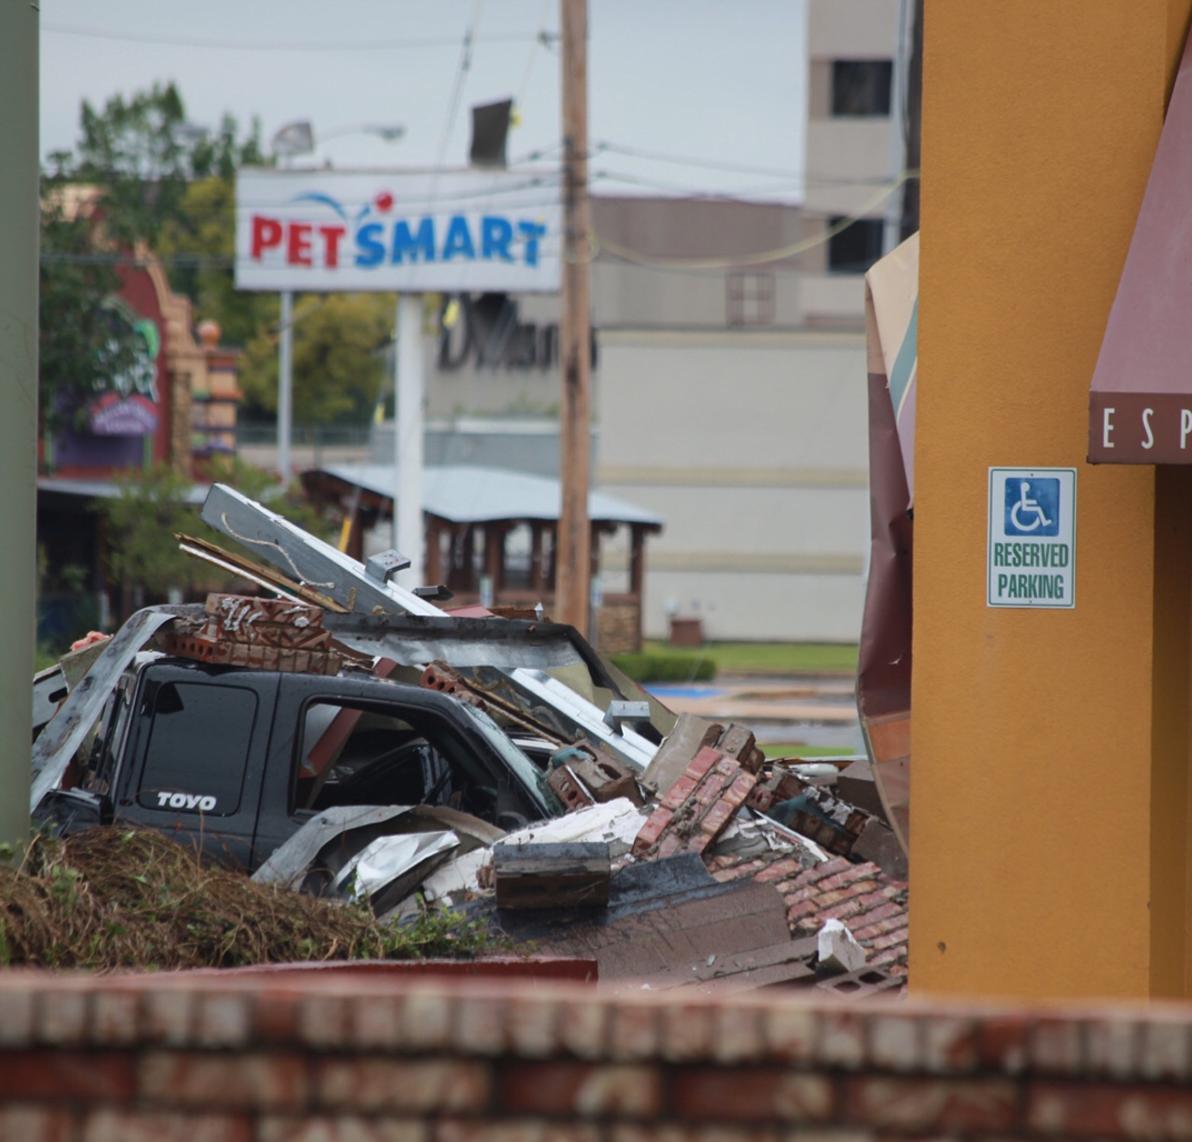 Photos: 3 tornadoes injure dozens in Tulsa, Oklahoma, area